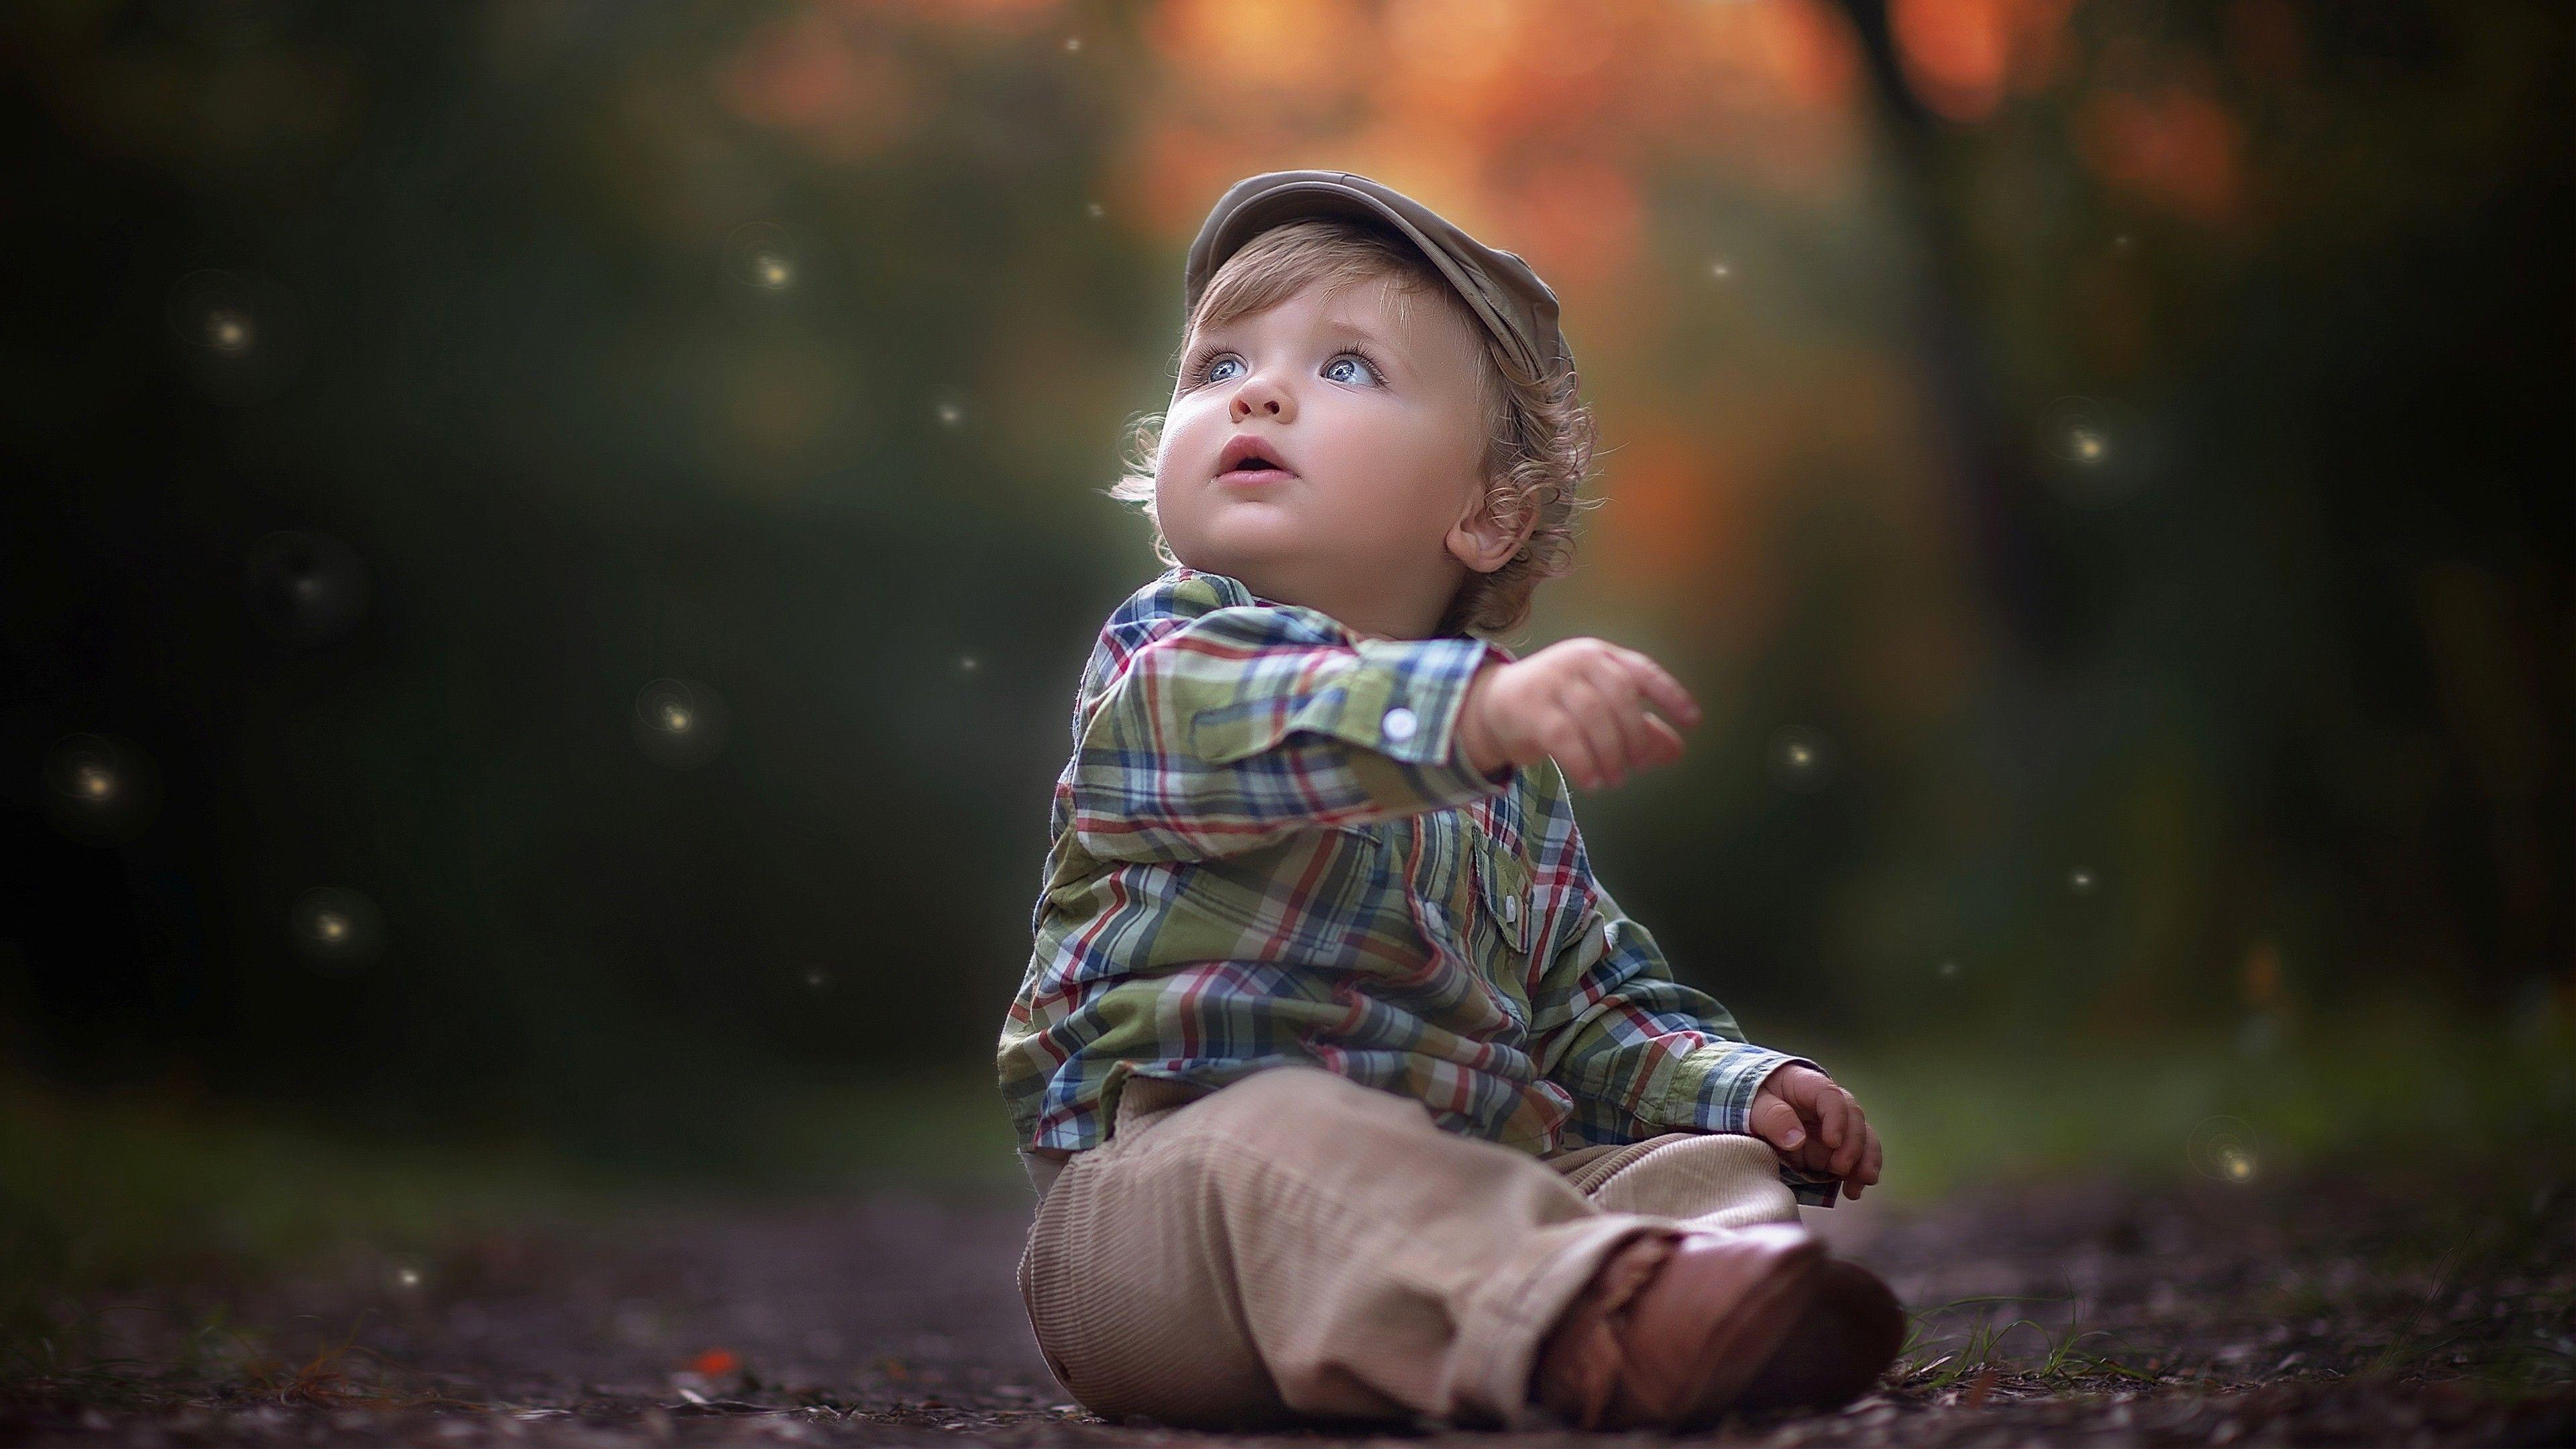 Cute Babies Wallpapers Top Free Cute Babies Backgrounds Wallpaperaccess